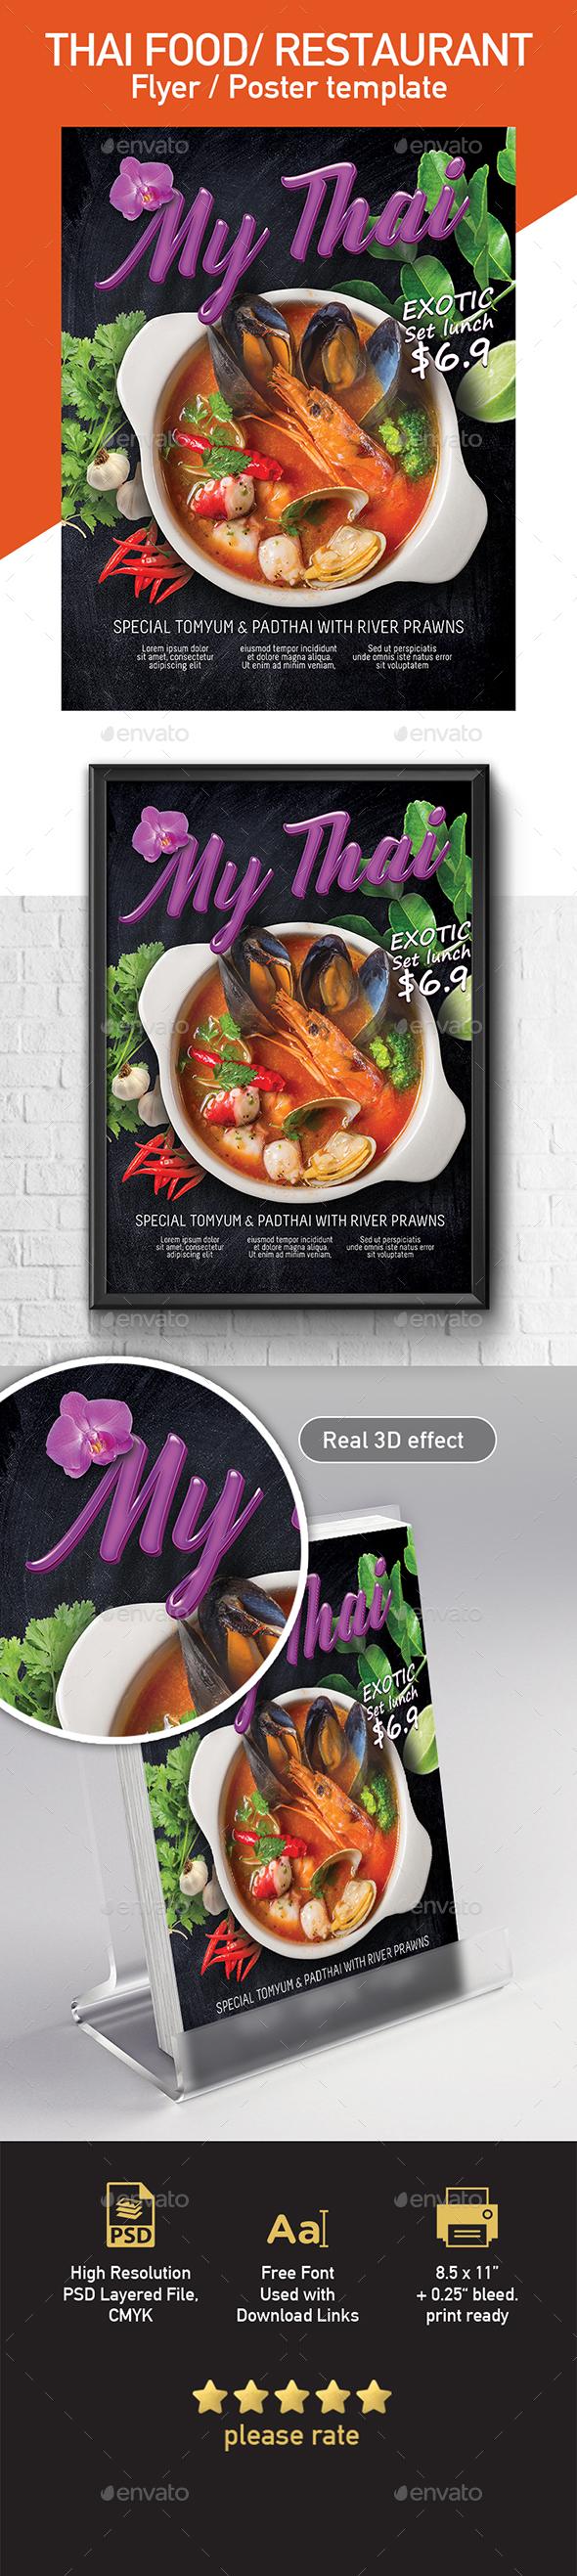 Thai Food Restaurant Poster / Flyer Template - Restaurant Flyers